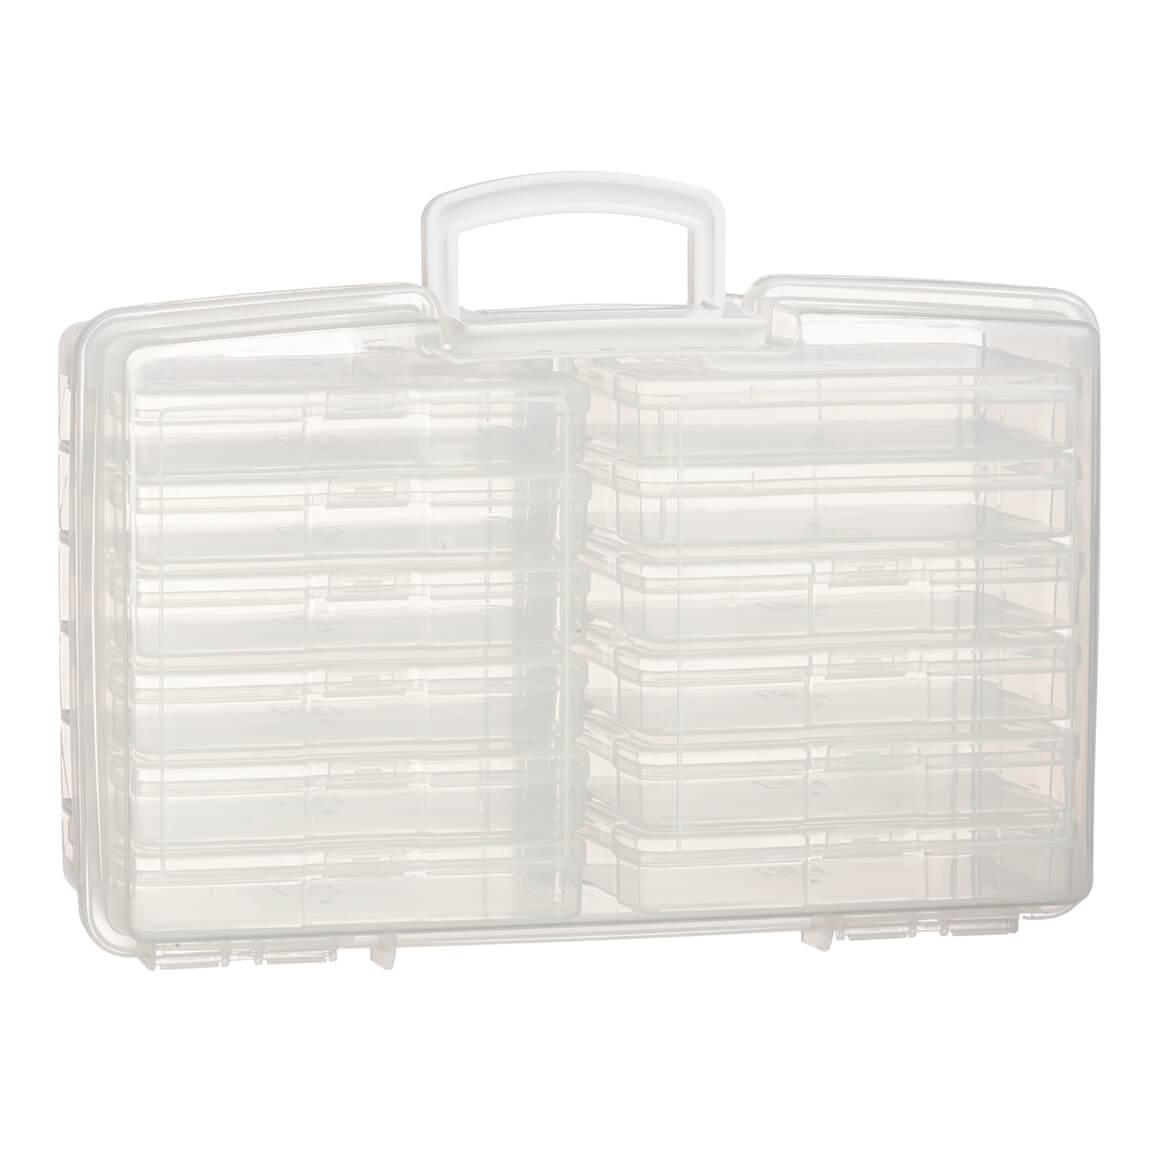 Plastic Photo Storage Set of 17-363347